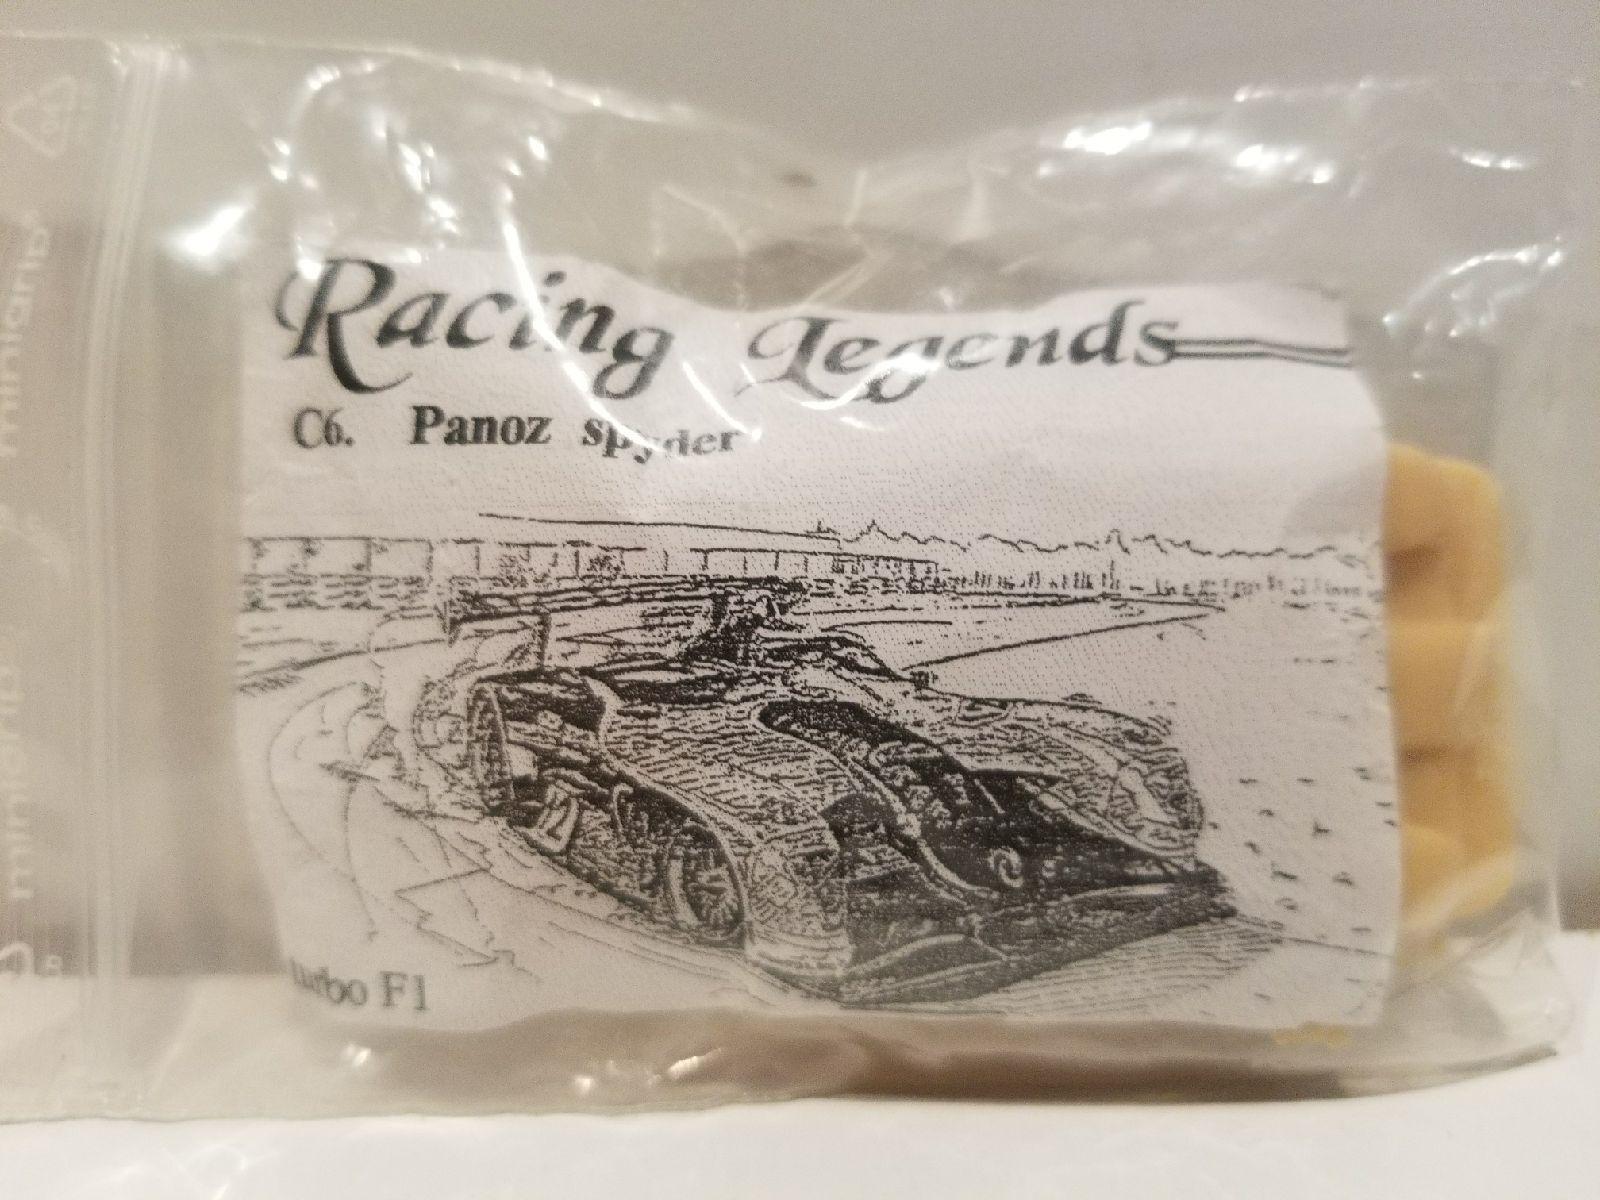 RARE RACING LEGENDS PANOZ SPYDER RACER HO SCALE RESIN SLOT CAR BODY KIT C6